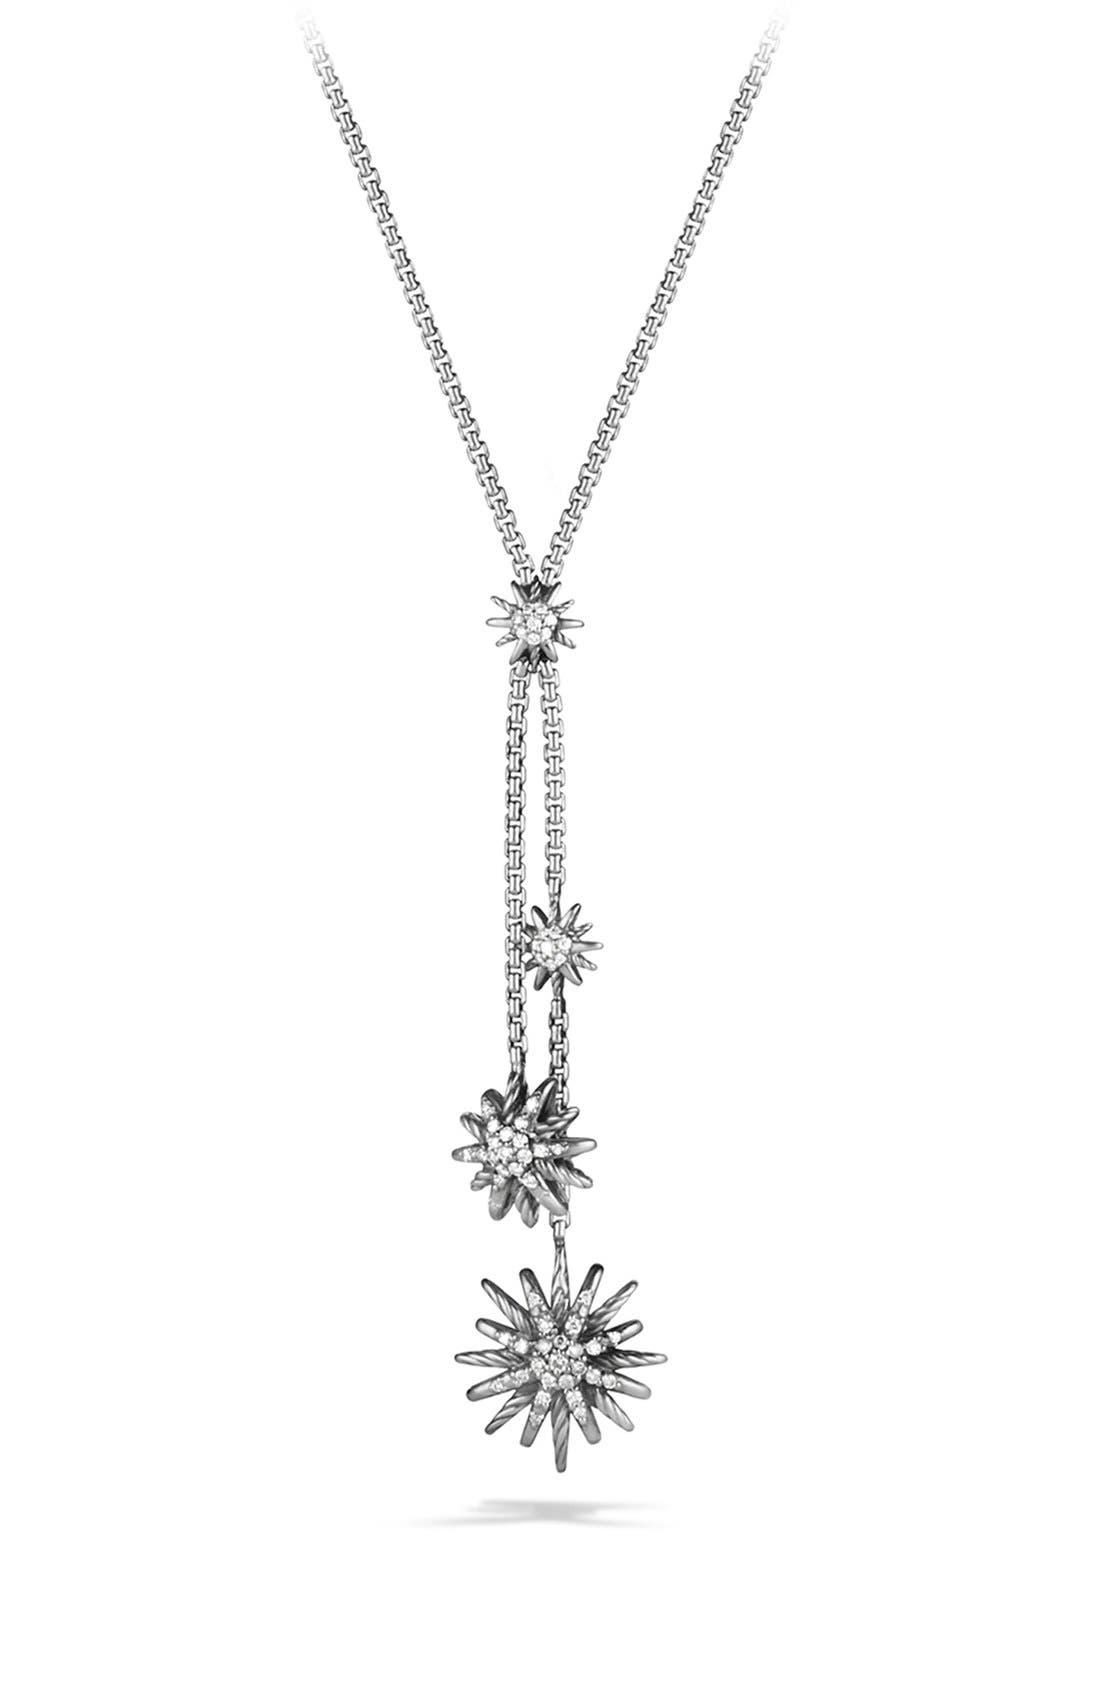 David Yurman 'Starburst' Y Necklace with Diamonds